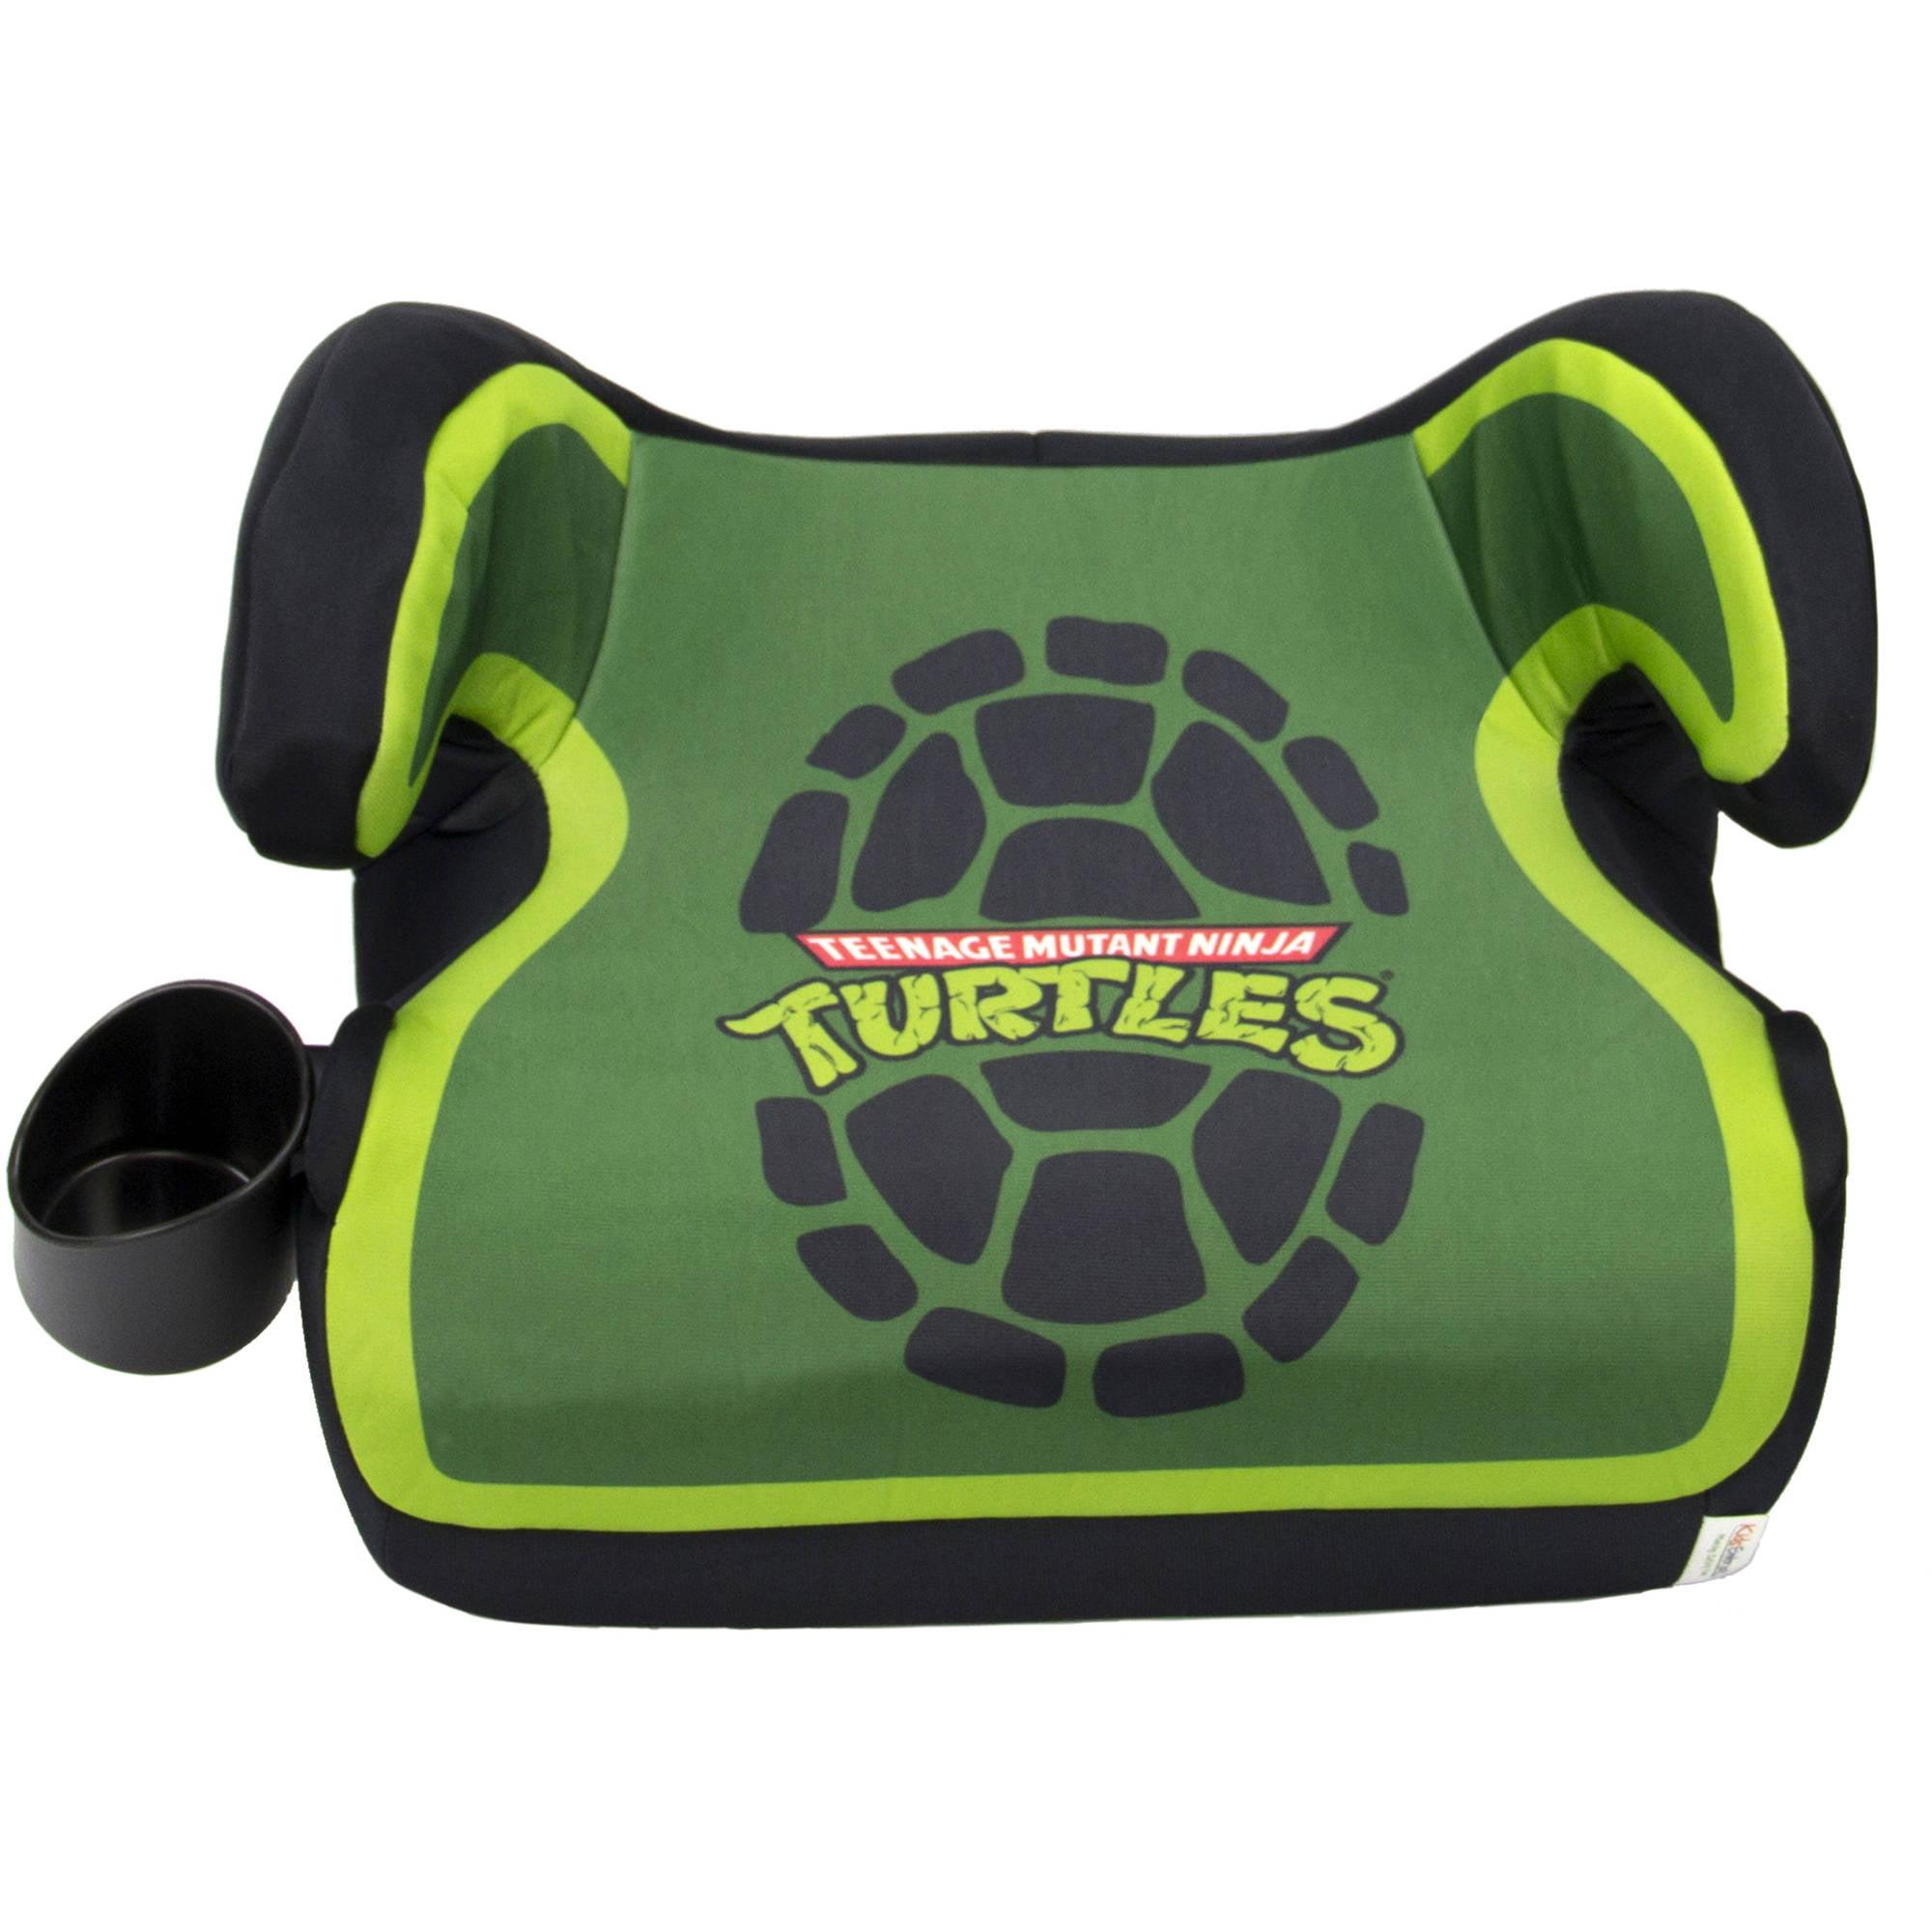 KidsEmbrace Fun-Ride Backless Booster Car Seat, Teenage Mutant Ninja Turtles